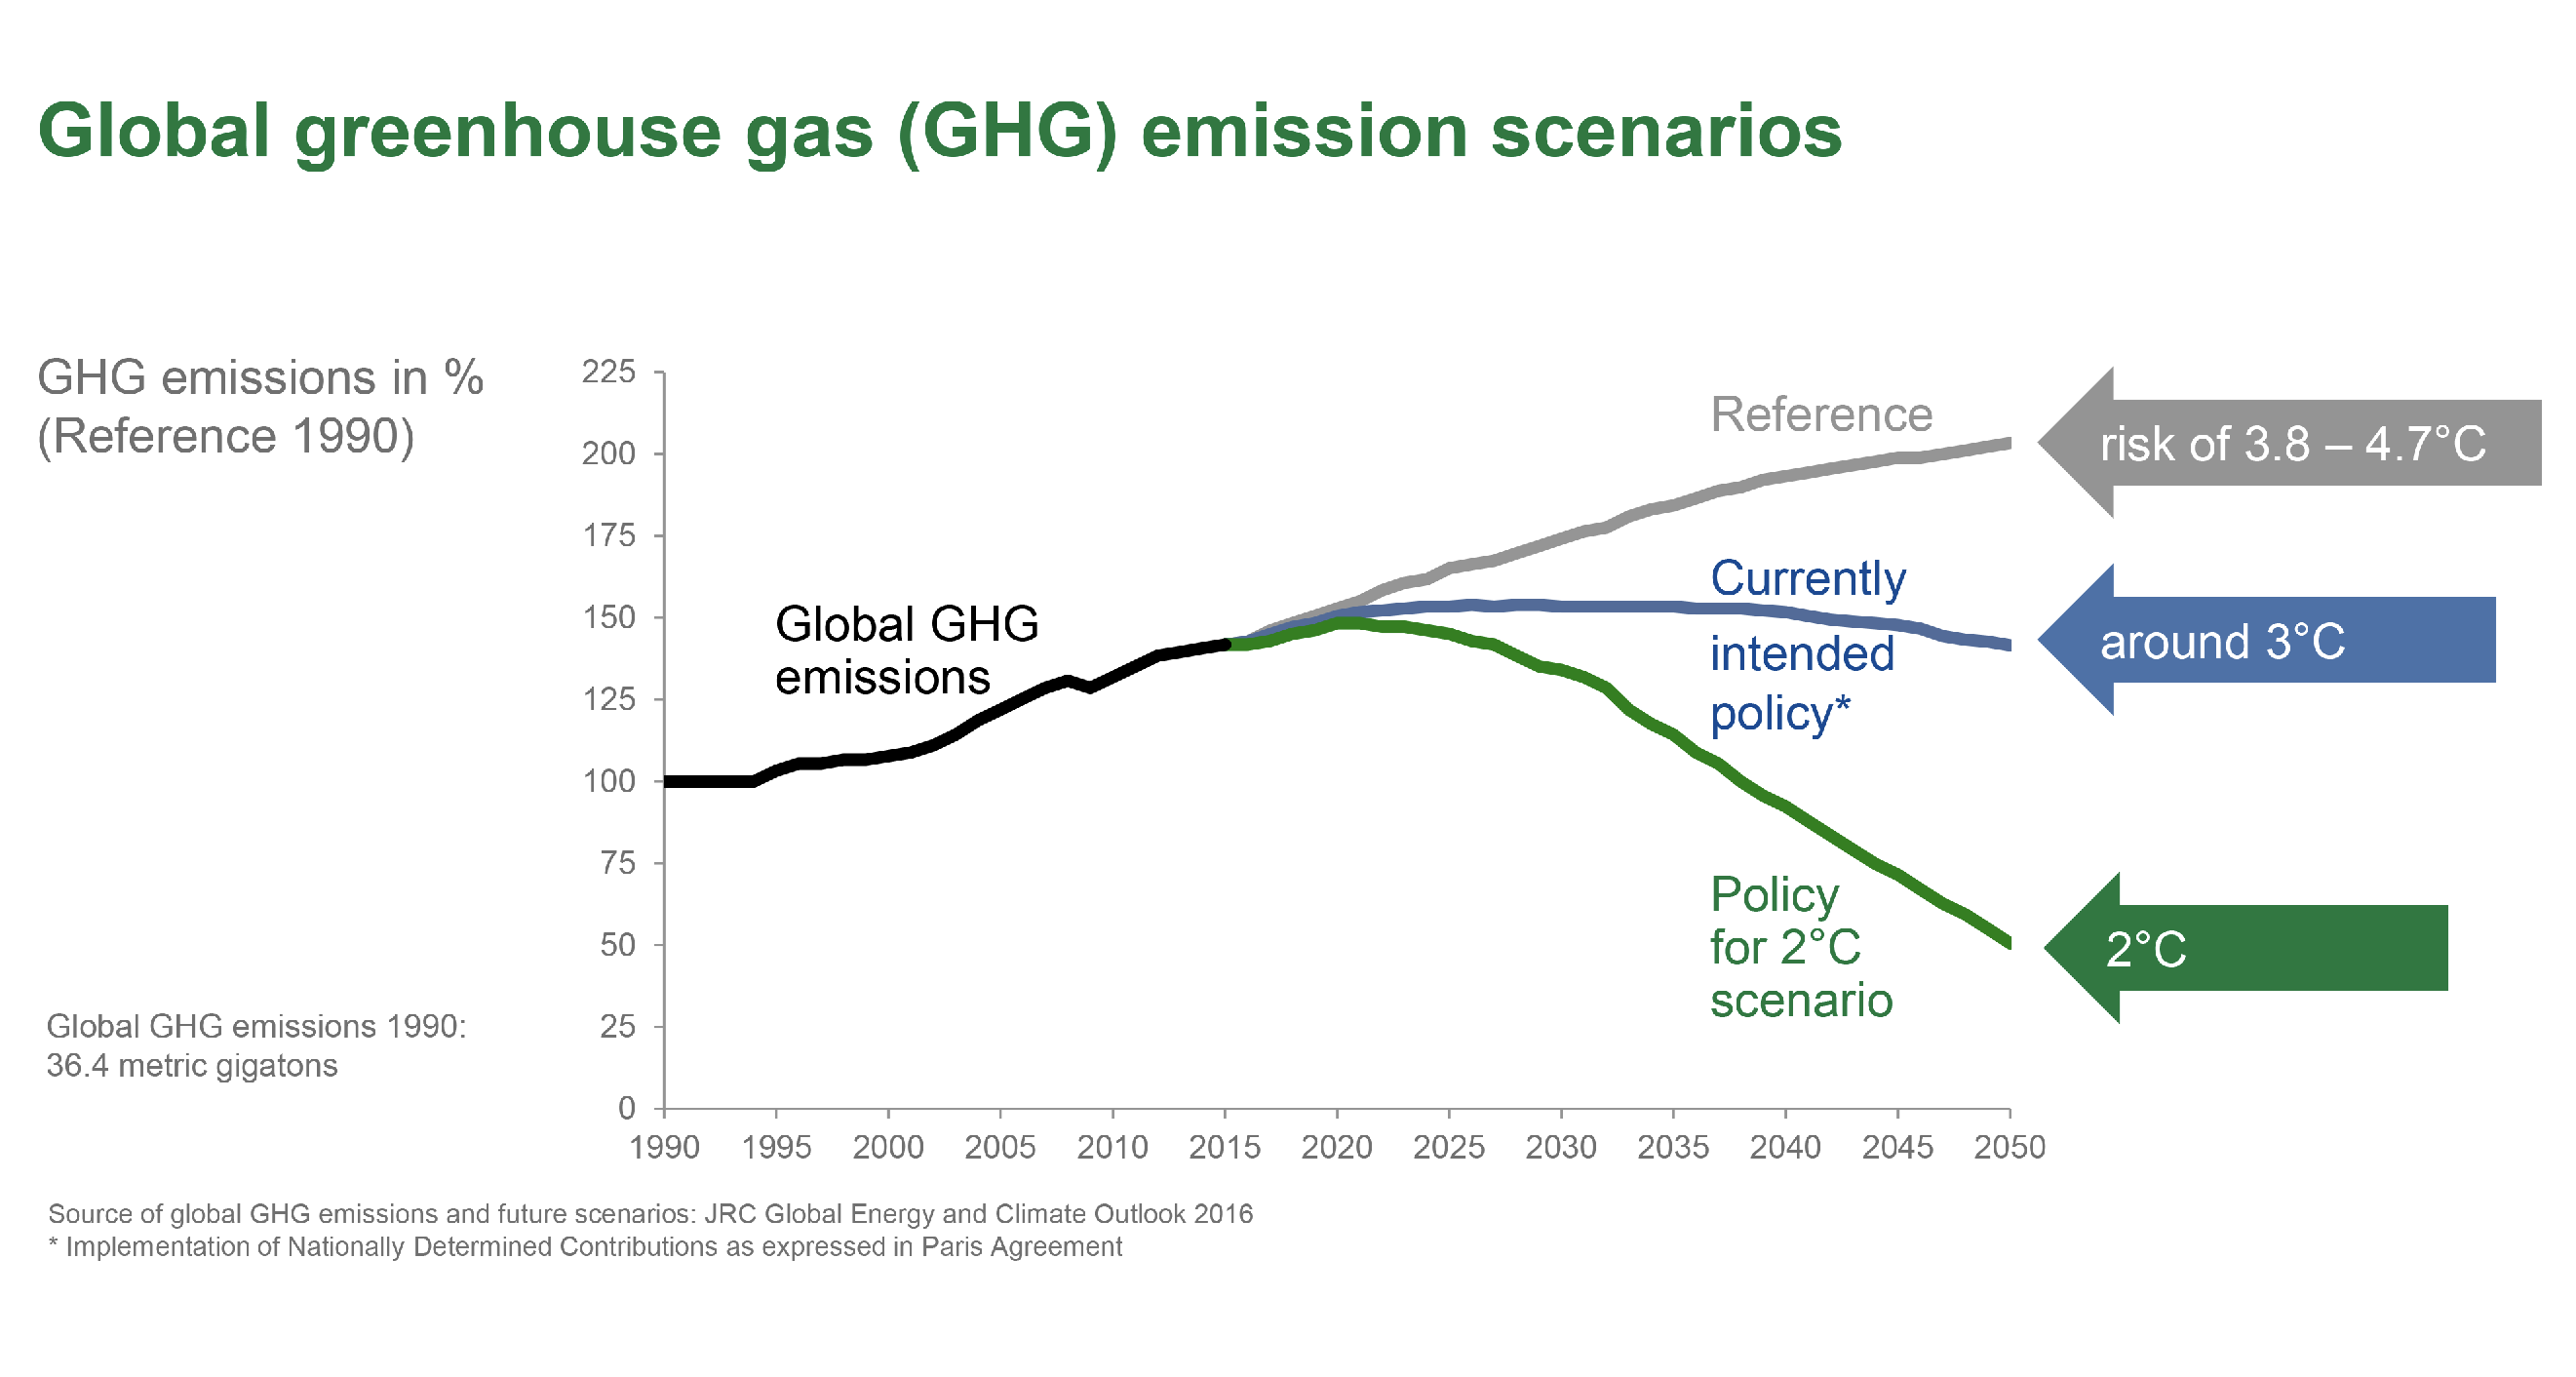 Three possible emission pathways